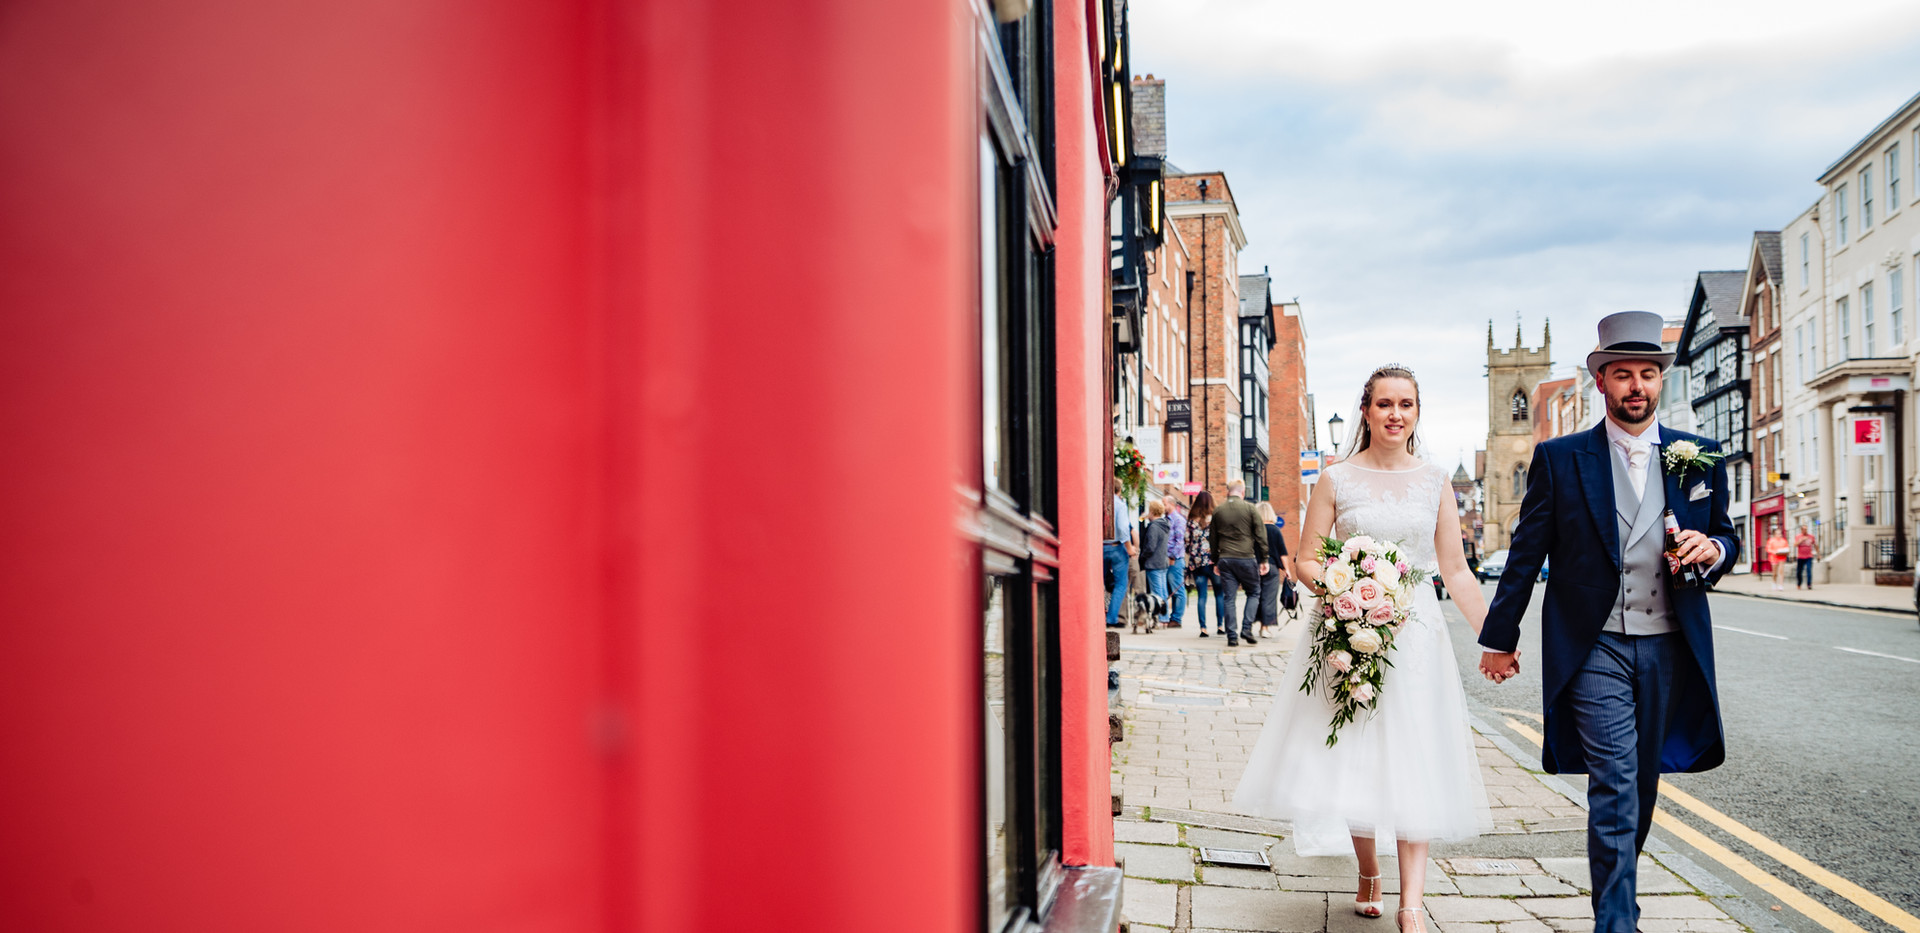 Oddfellows Wedding Photography___20.jpg